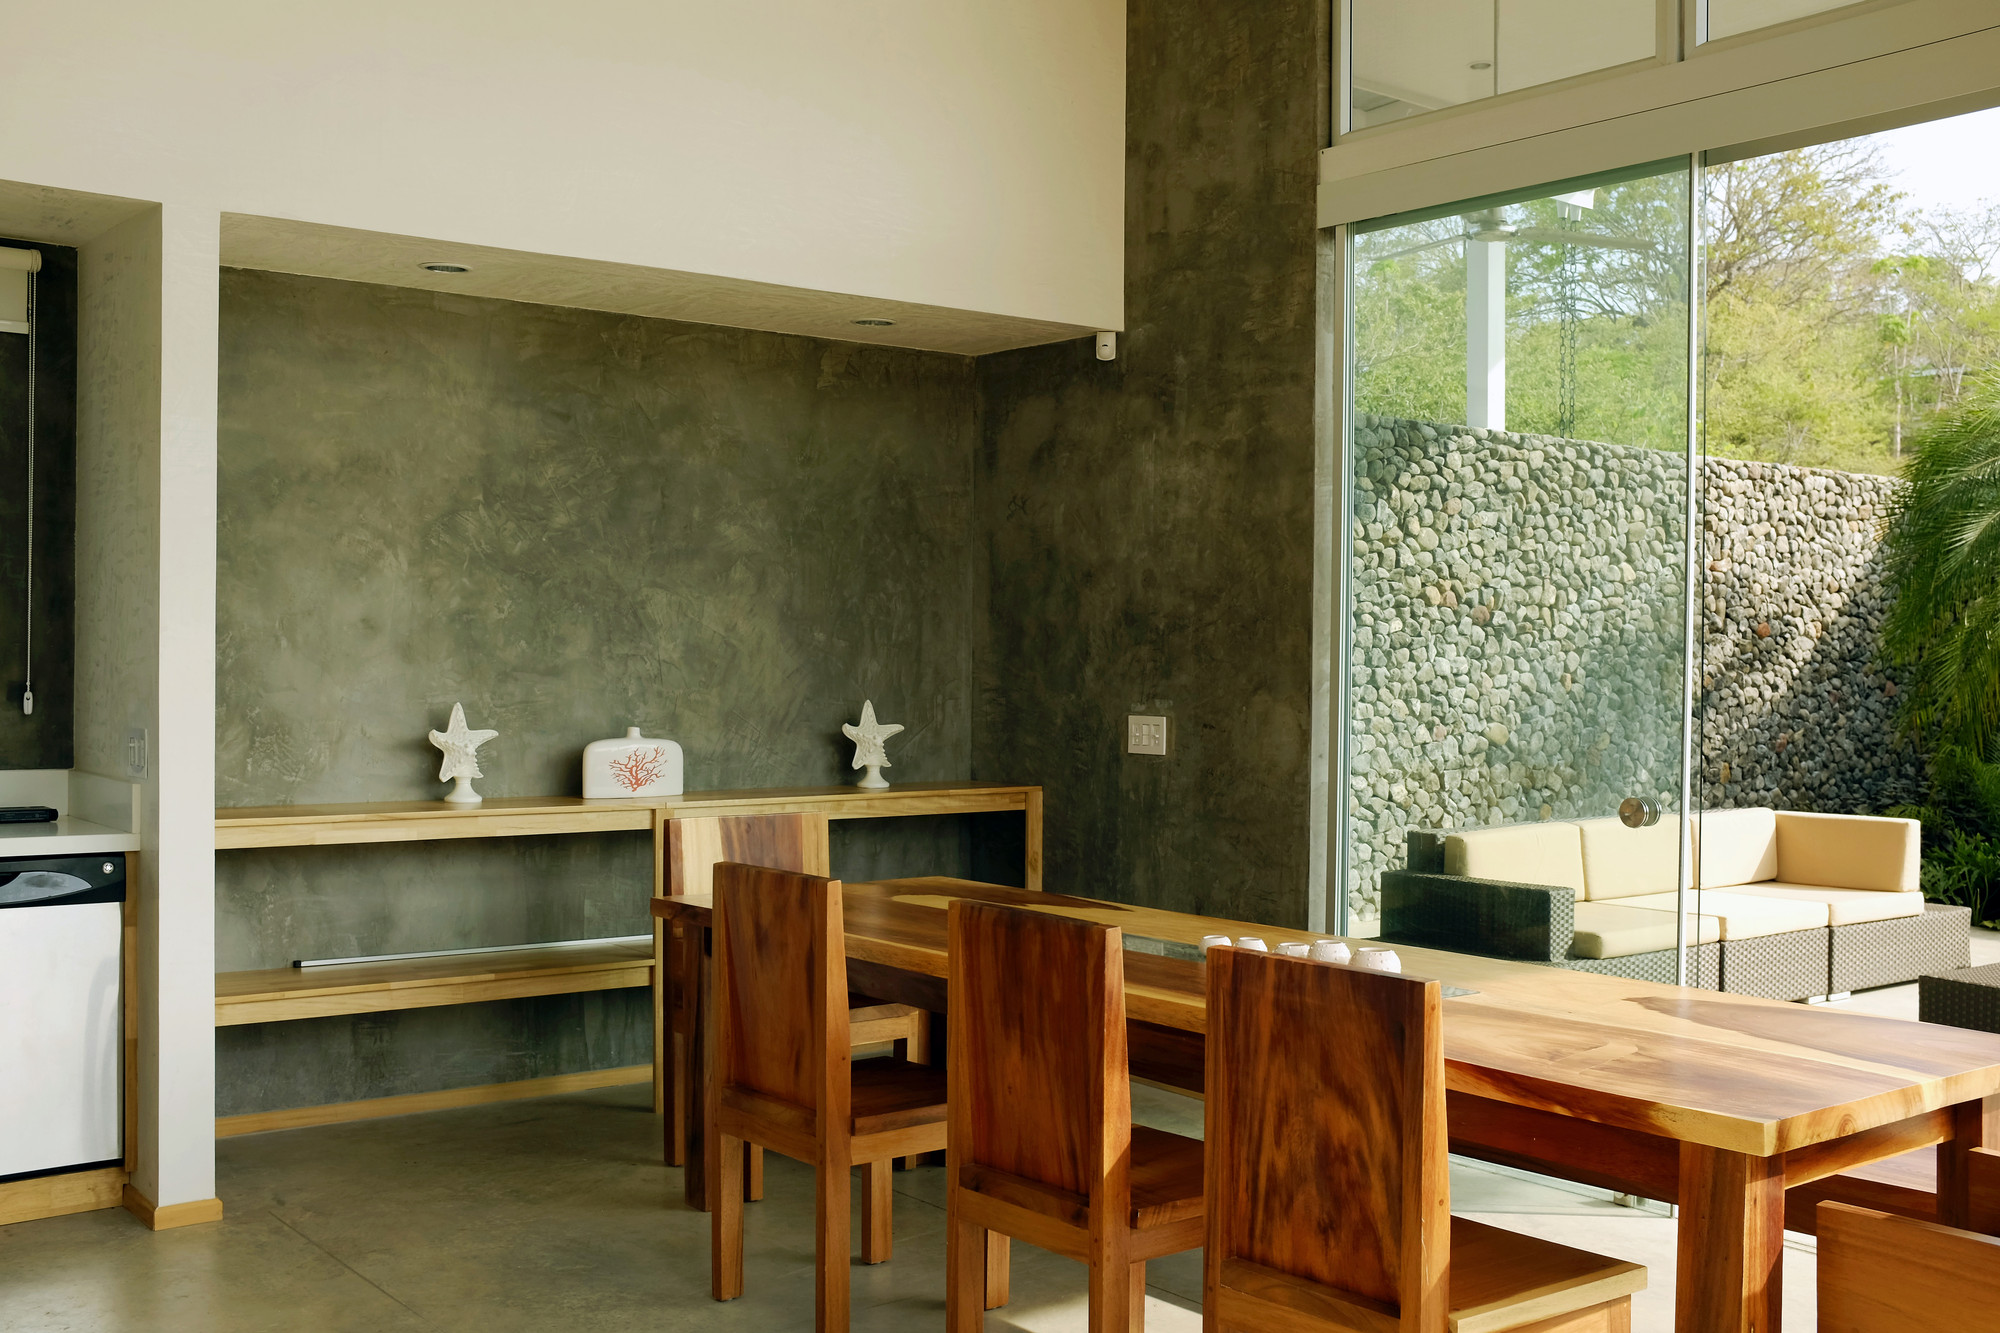 Galer a de casa jard n del mar salagnac arquitectos 5 for Casas jardin del mar